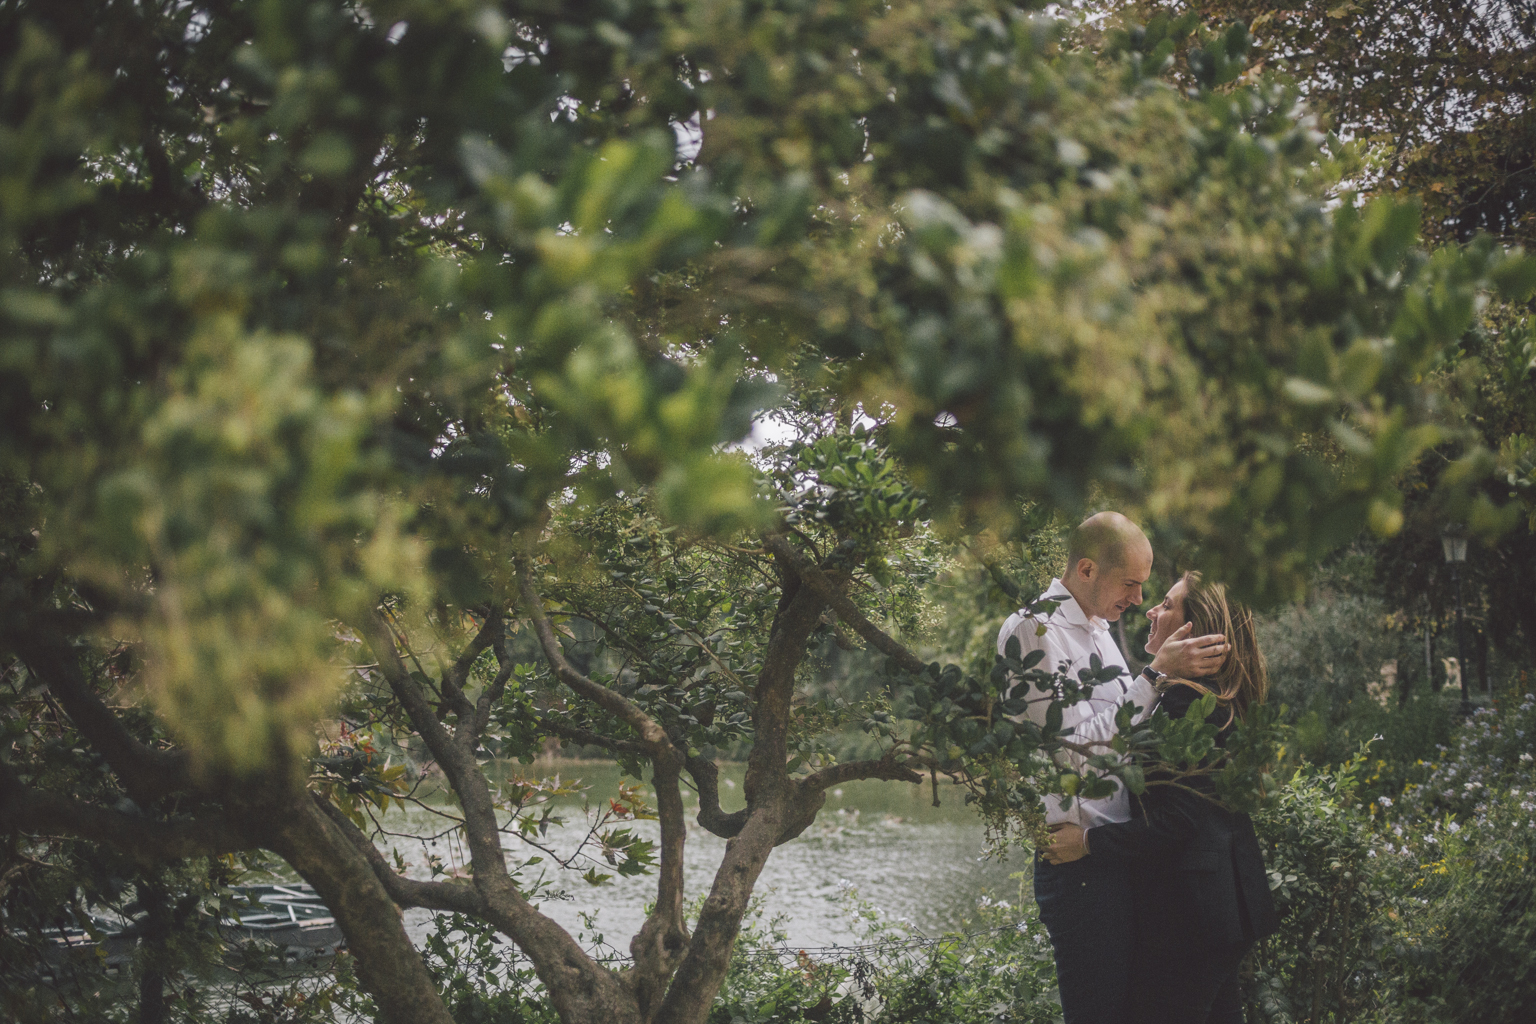 Fotógrafo de pareja Barcelona :: Parc de la Ciutadella fotógrafo de parejas Barcelona :: fotógrafo de preboda :: preboda en el parc de la Ciutadella :: Preboda en Barcelona :: Reportaje romántico :: Fotógrafo romántico diferente :: Fotógrafo de bodas barcelona :: Destiny wedding photographer :: Barcelona photographer